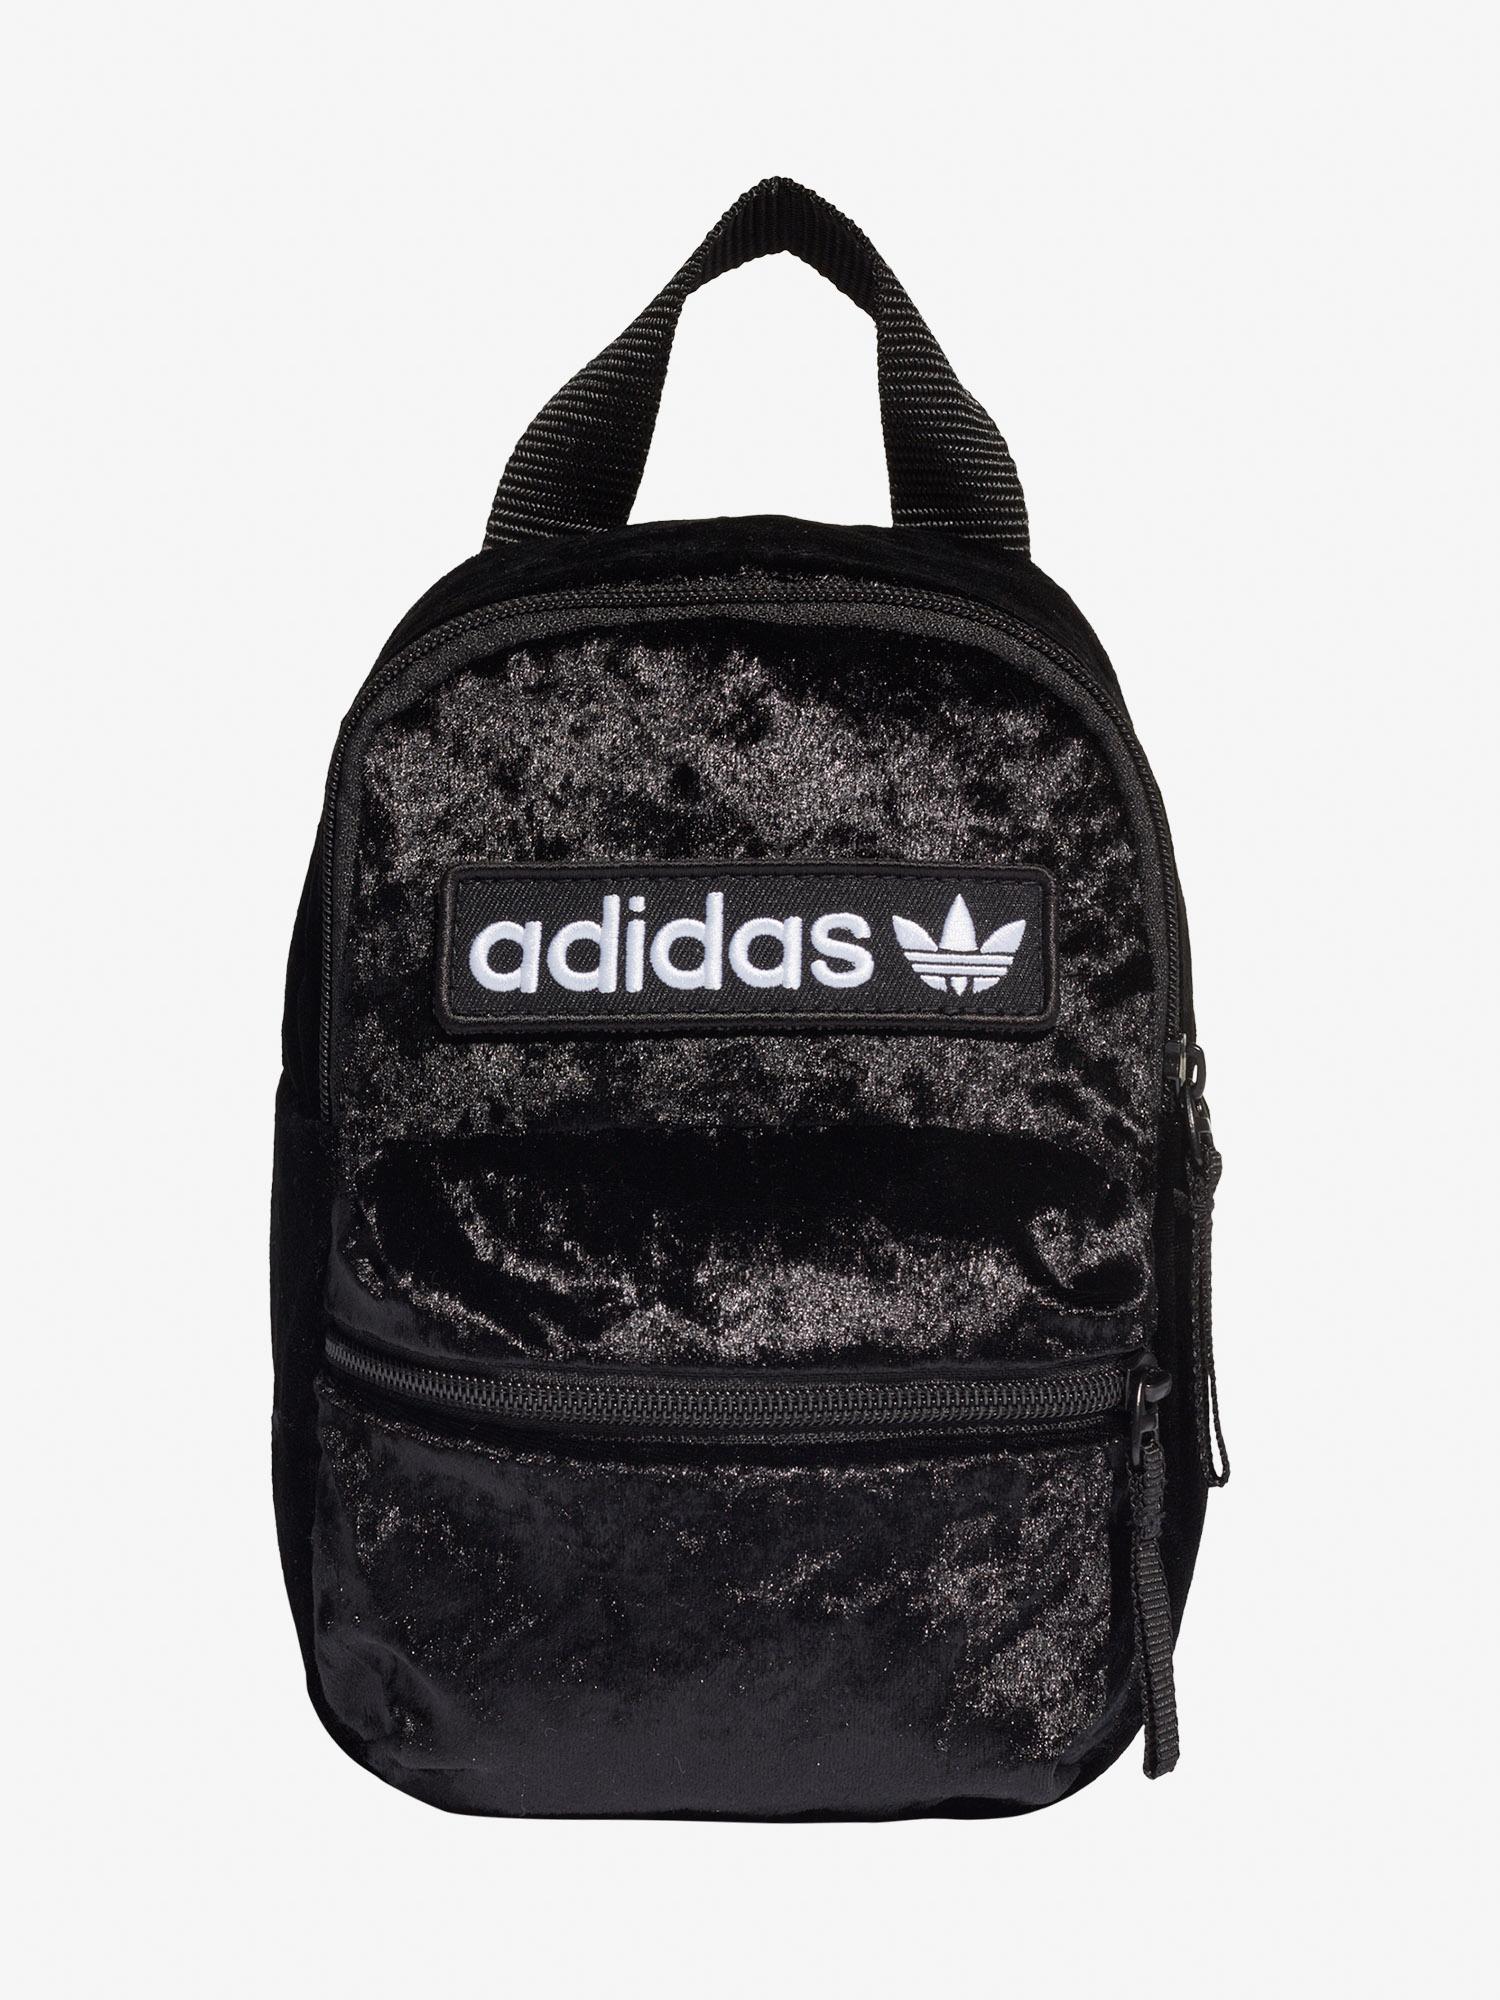 Adidas Originals Bp Mini Backpack